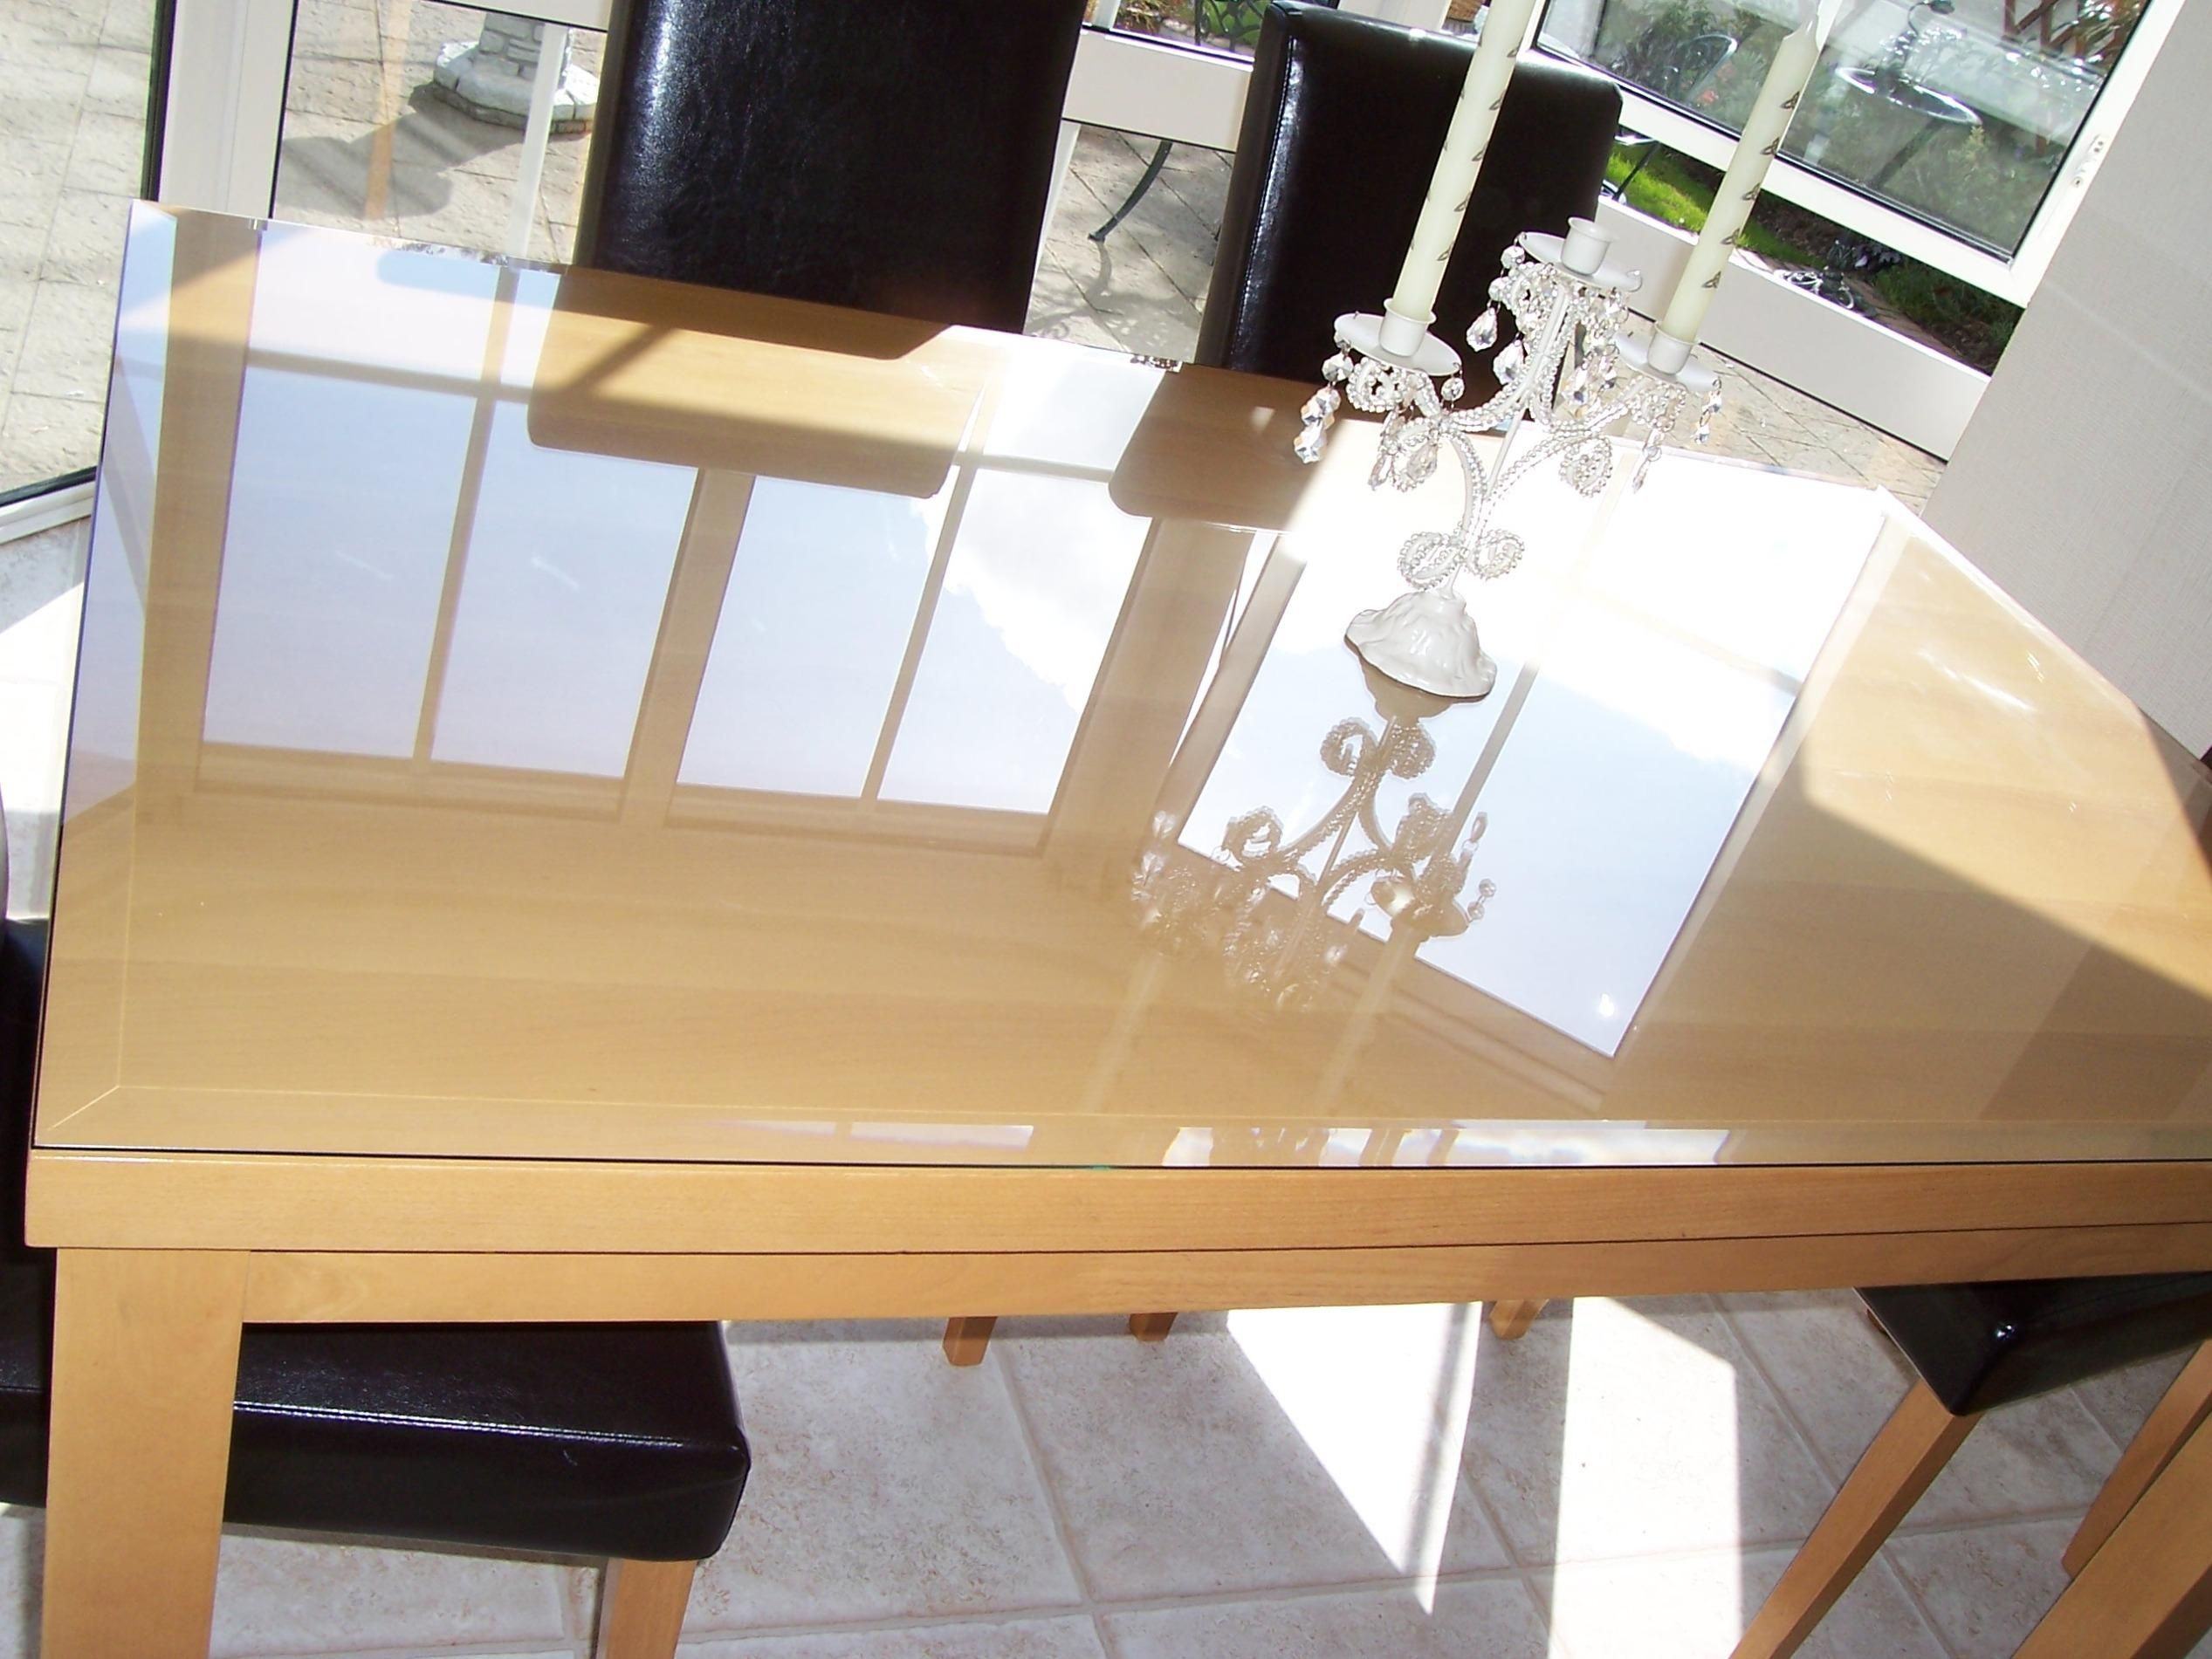 54 Round Plexiglass Table Top